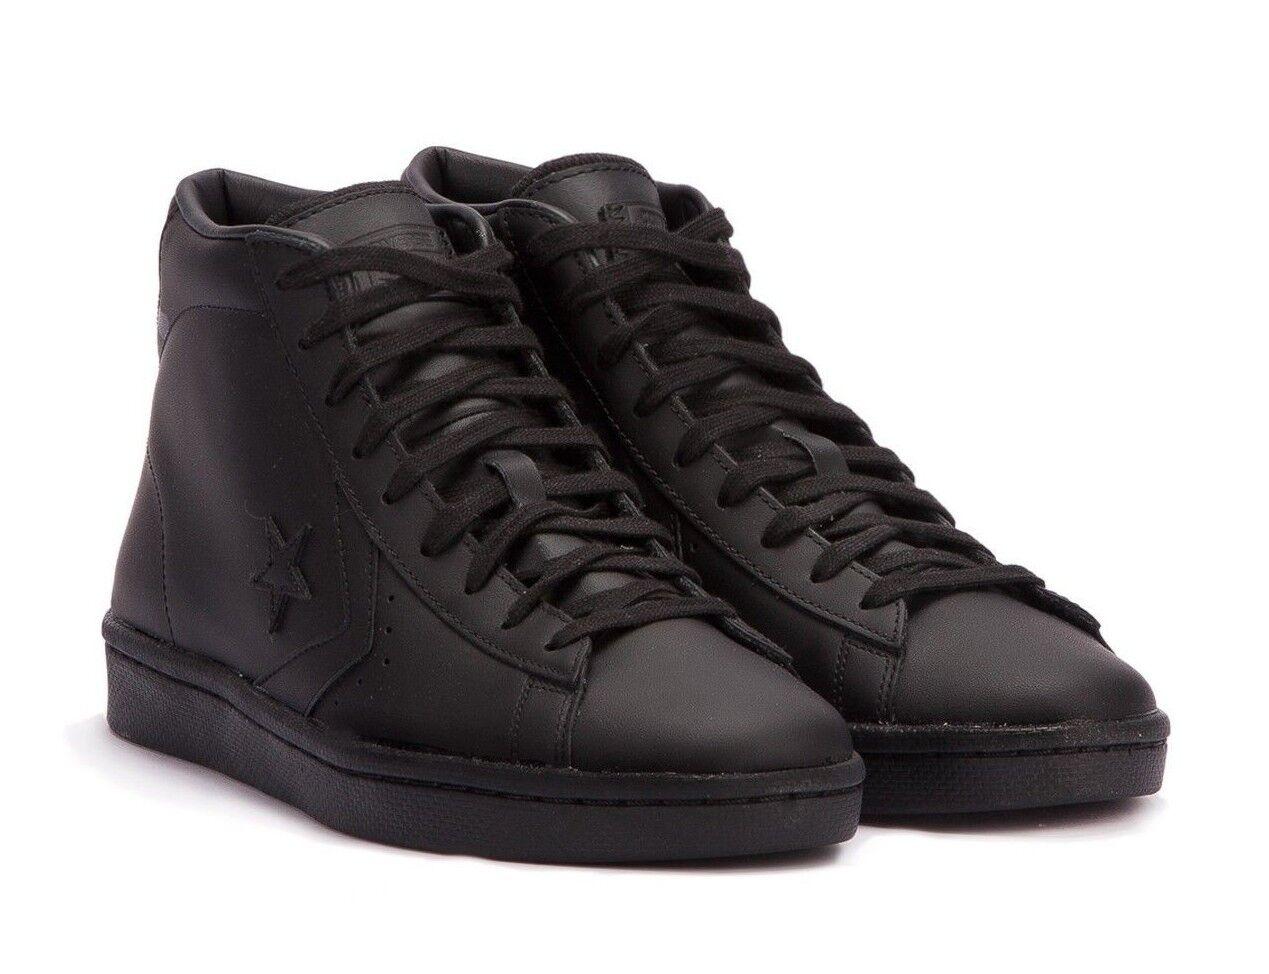 Converse Pro Leather 76 Hi Cuero Negro Tenis de Tobillo Alto 155334C